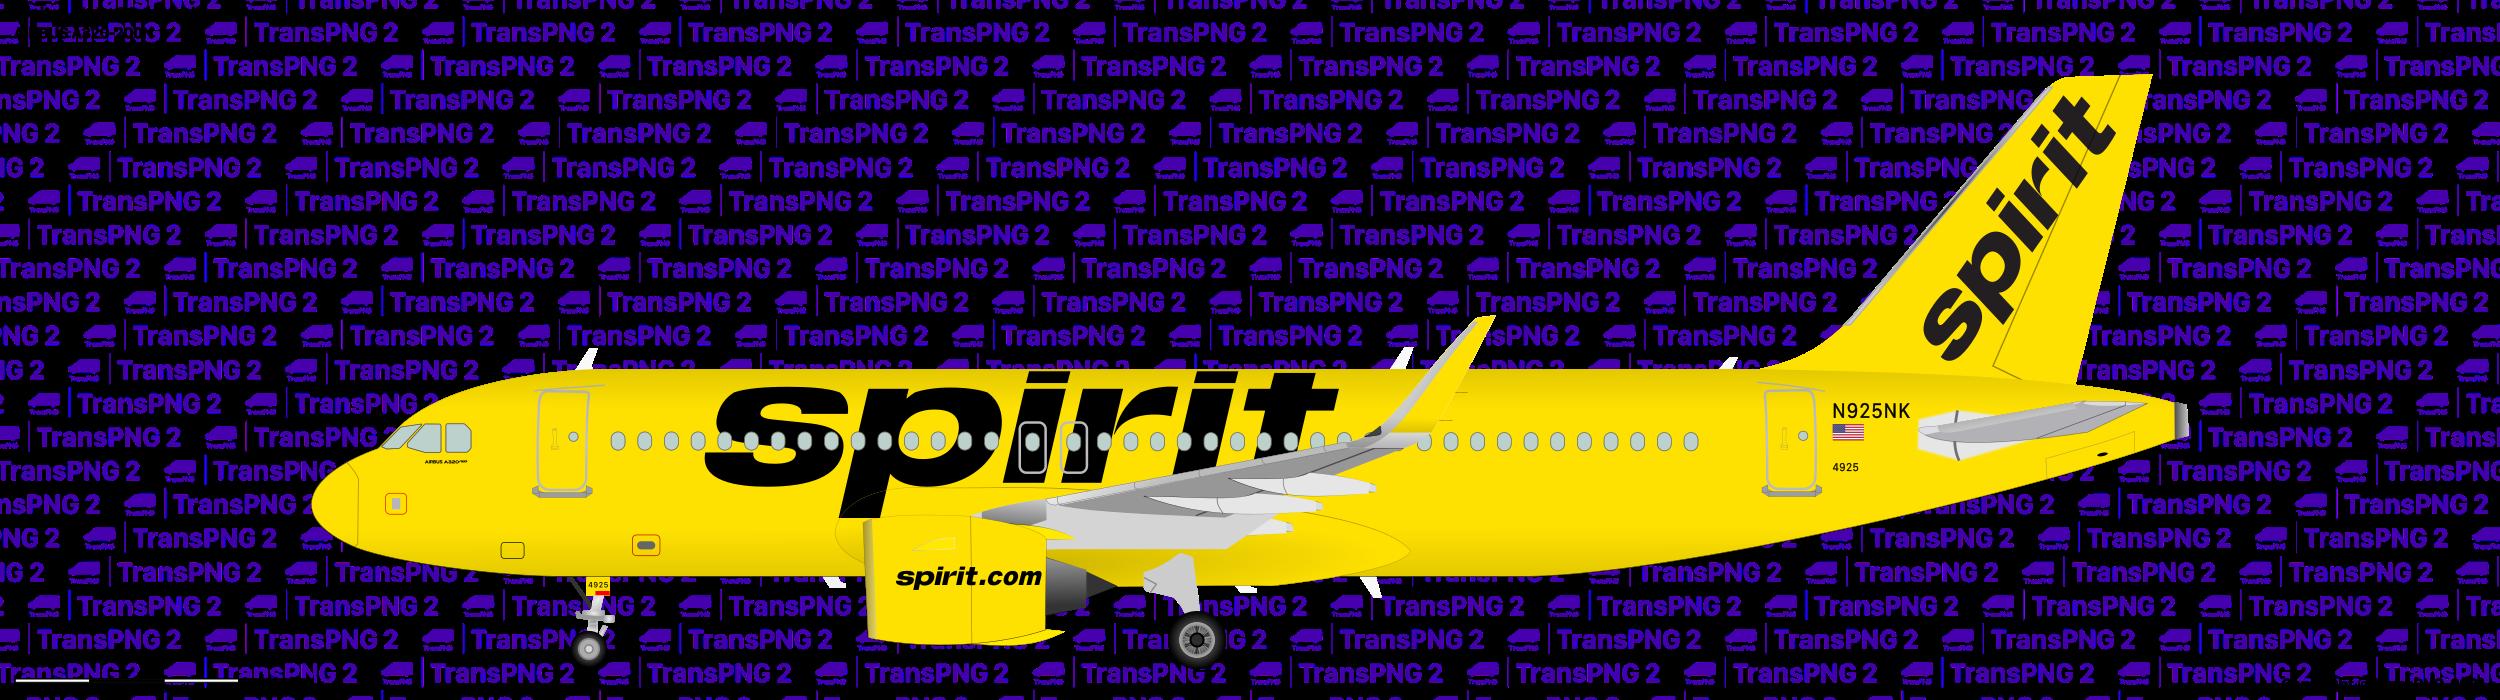 Airplane 25120